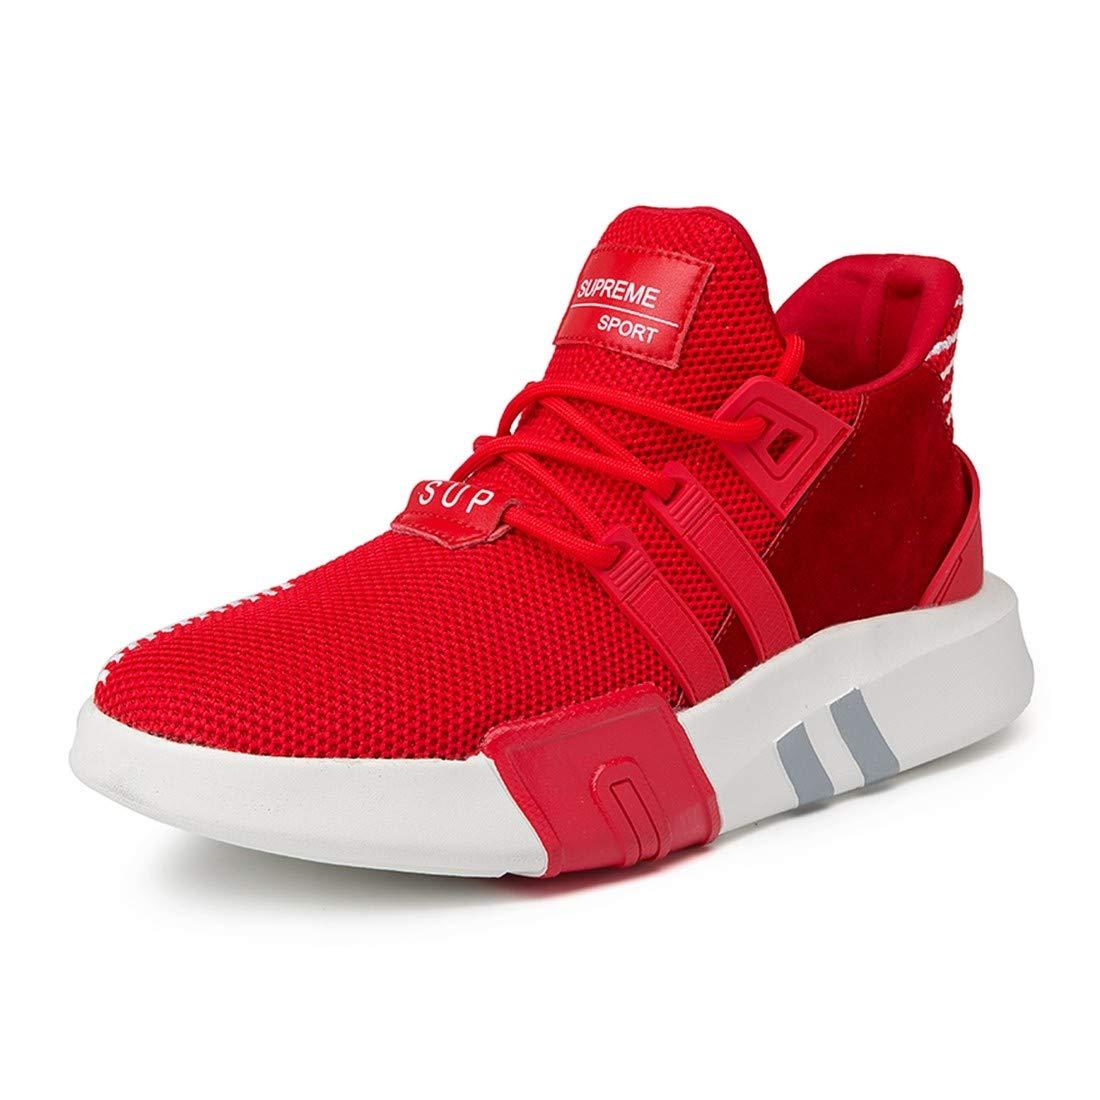 As shown YAYADI Schuhe Herren Sneakers Frühling Und Sommer